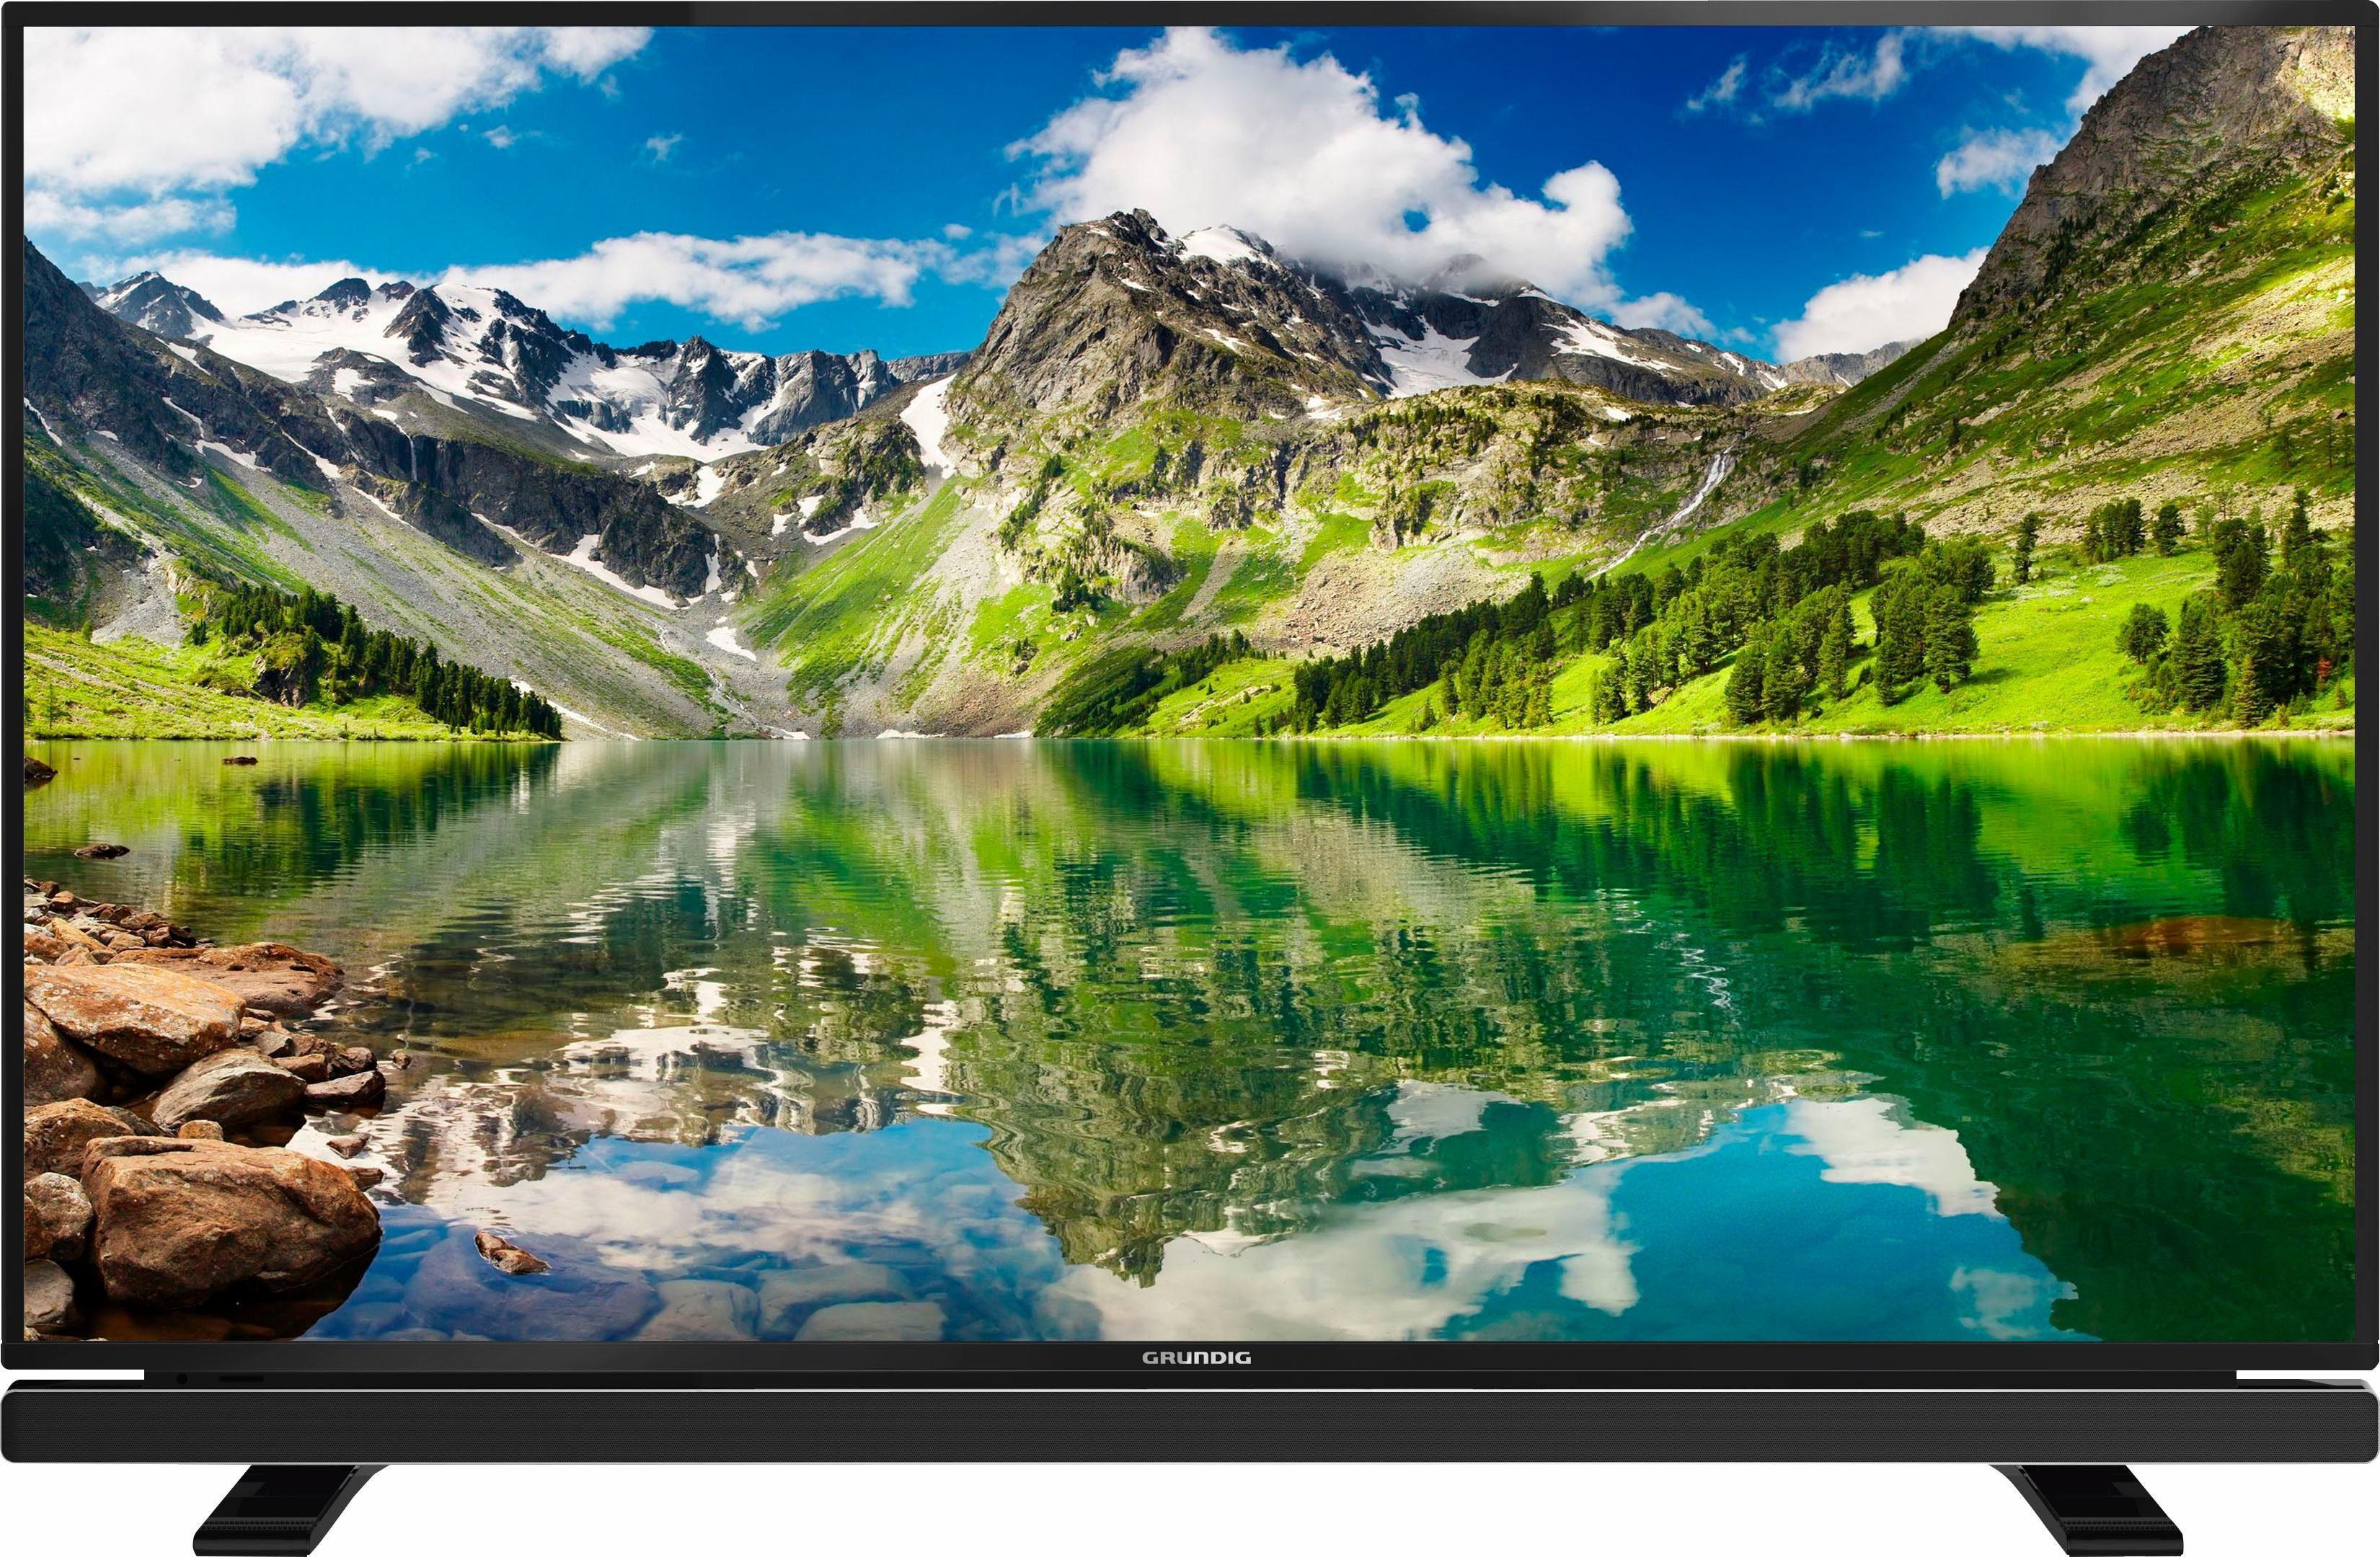 Grundig 32 VLE 510 BL LED Fernseher (80 cm/32 Zoll, HD, Smart-TV)